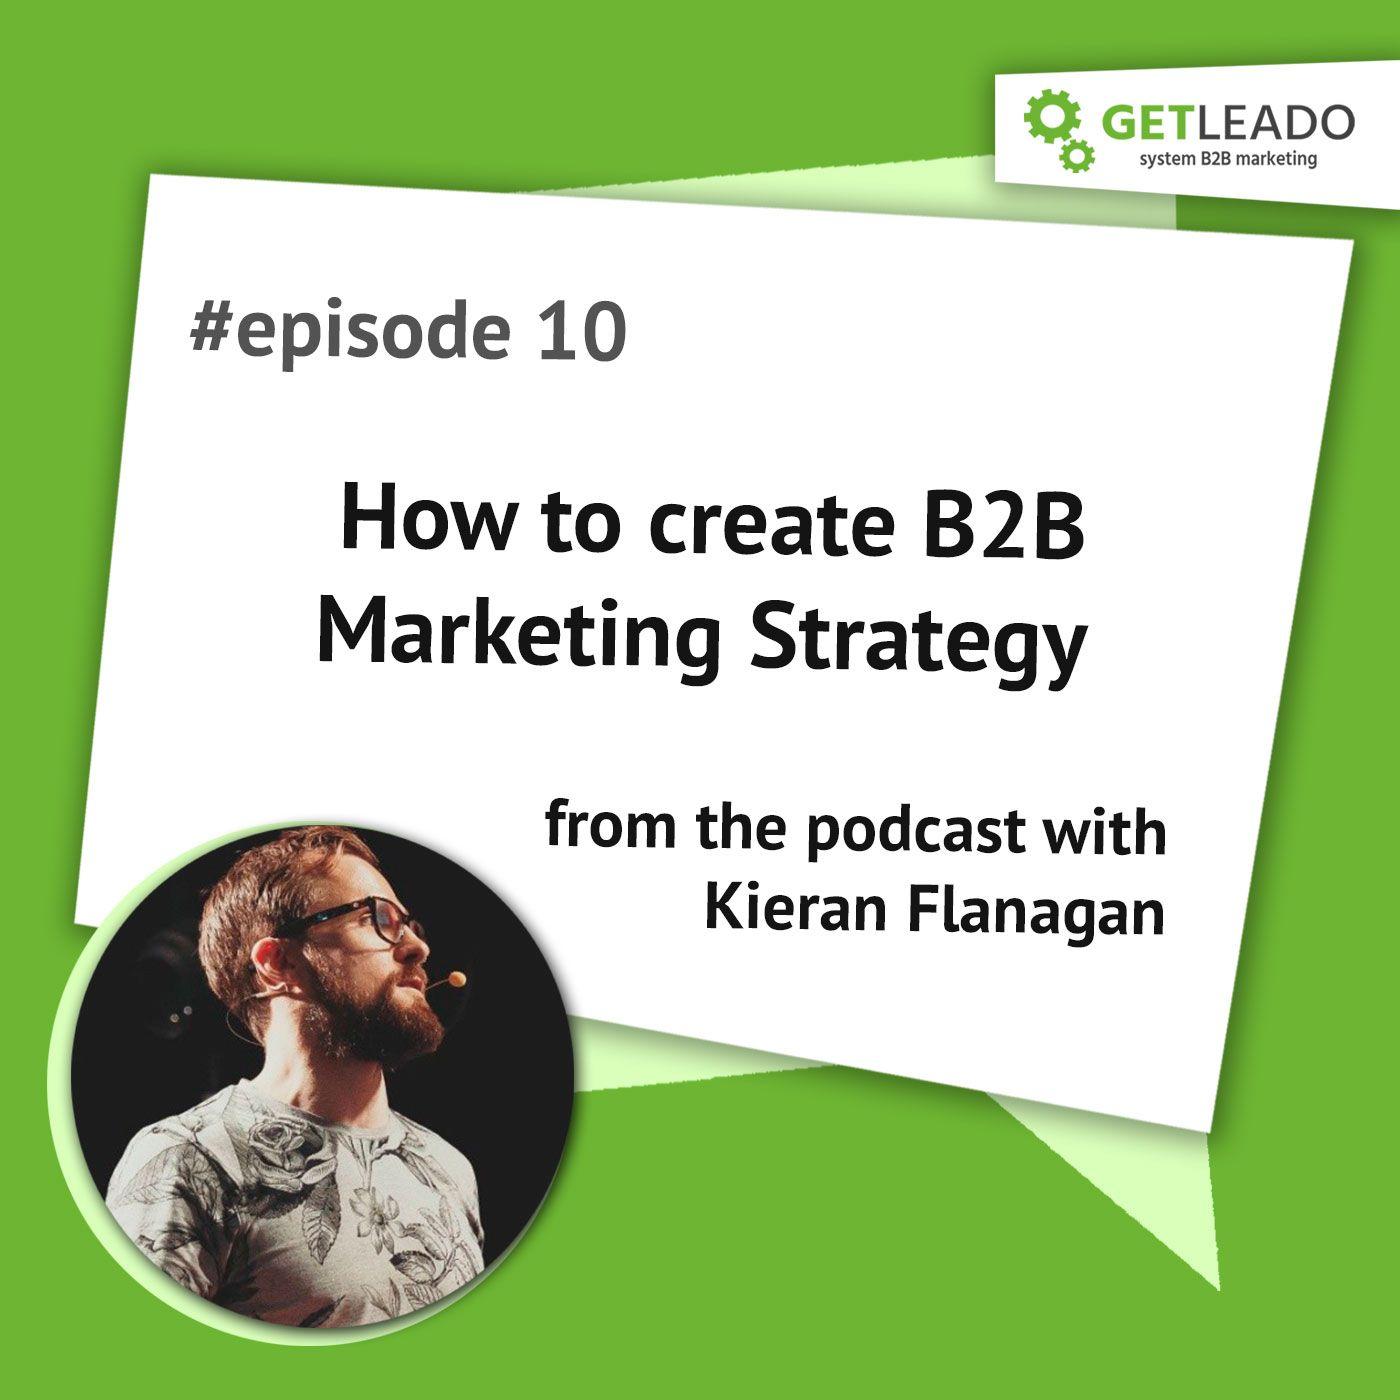 Episode 10. How to create a B2B marketing strategy with Kieran Flanagan